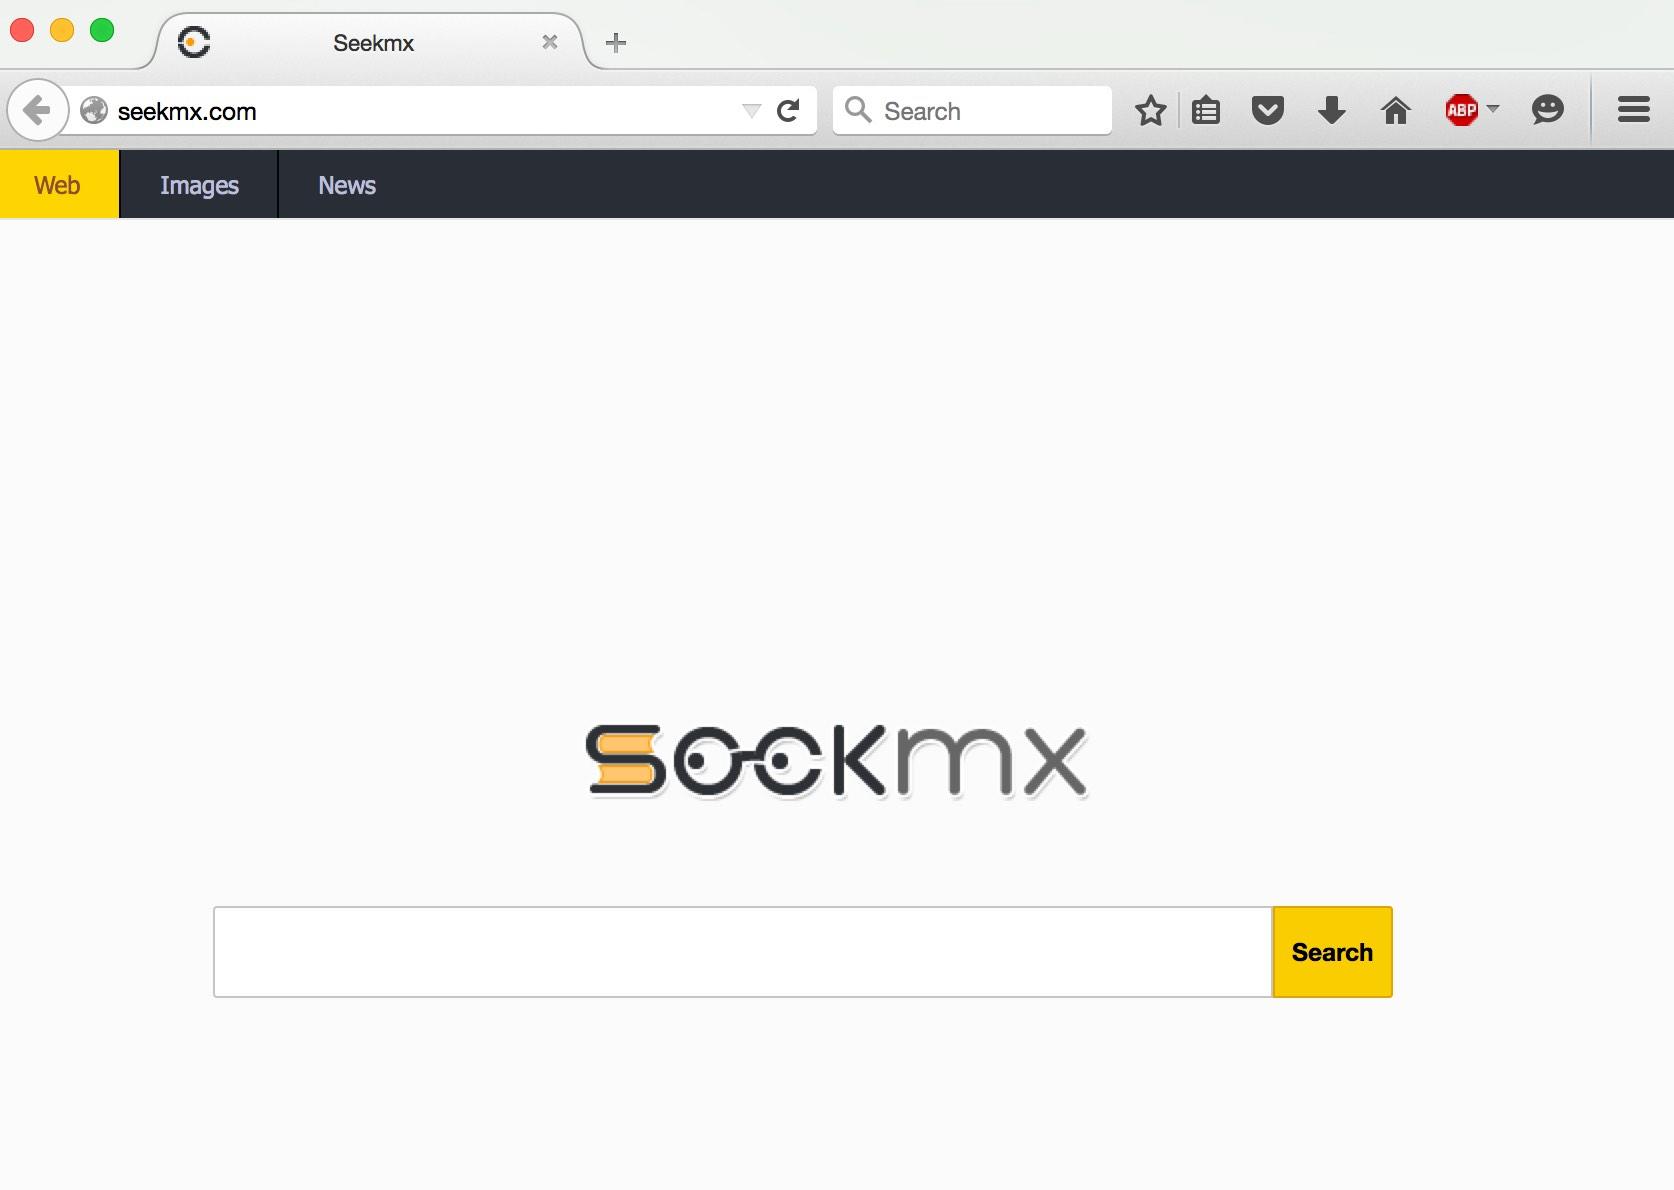 Seekmx.com